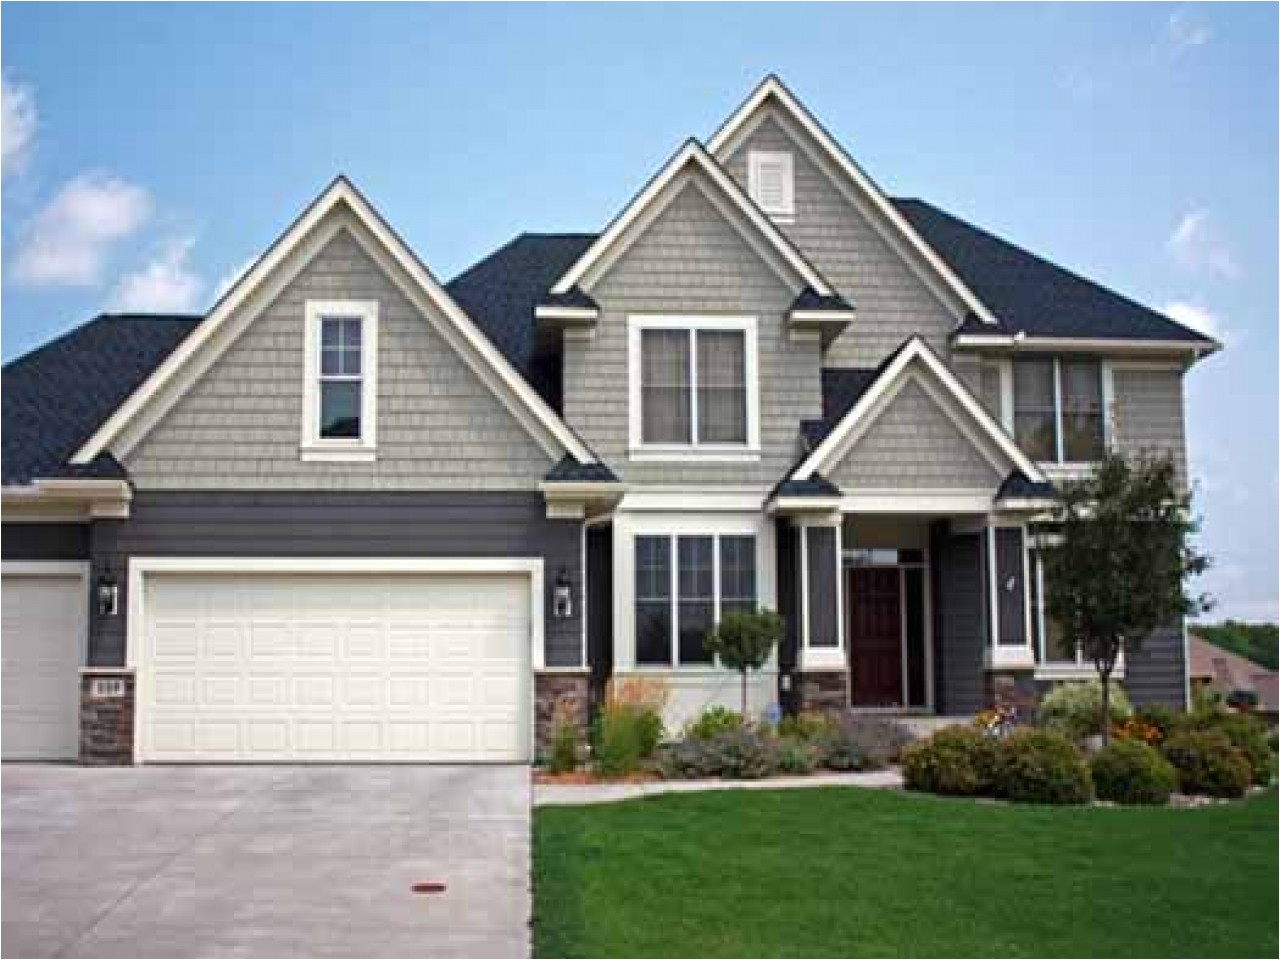 728a70477d3f5c9e historic 2 story craftsman style 2 story craftsman style house plans